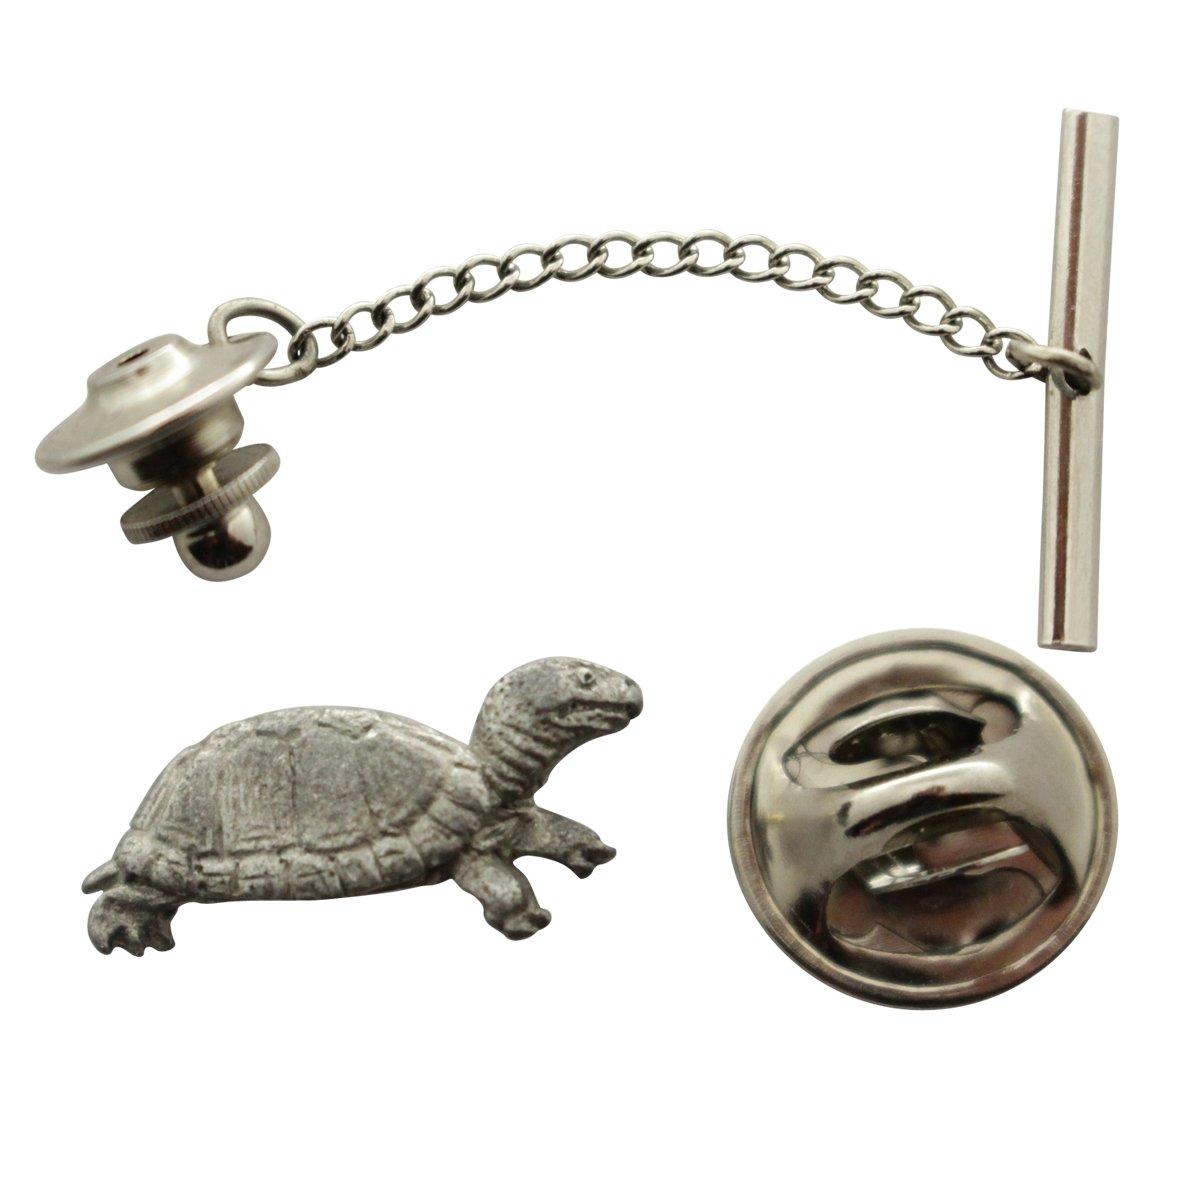 Box Turtle Tie Tack ~ Antiqued Pewter ~ Tie Tack or Pin ~ Sarah's Treats & Treasures